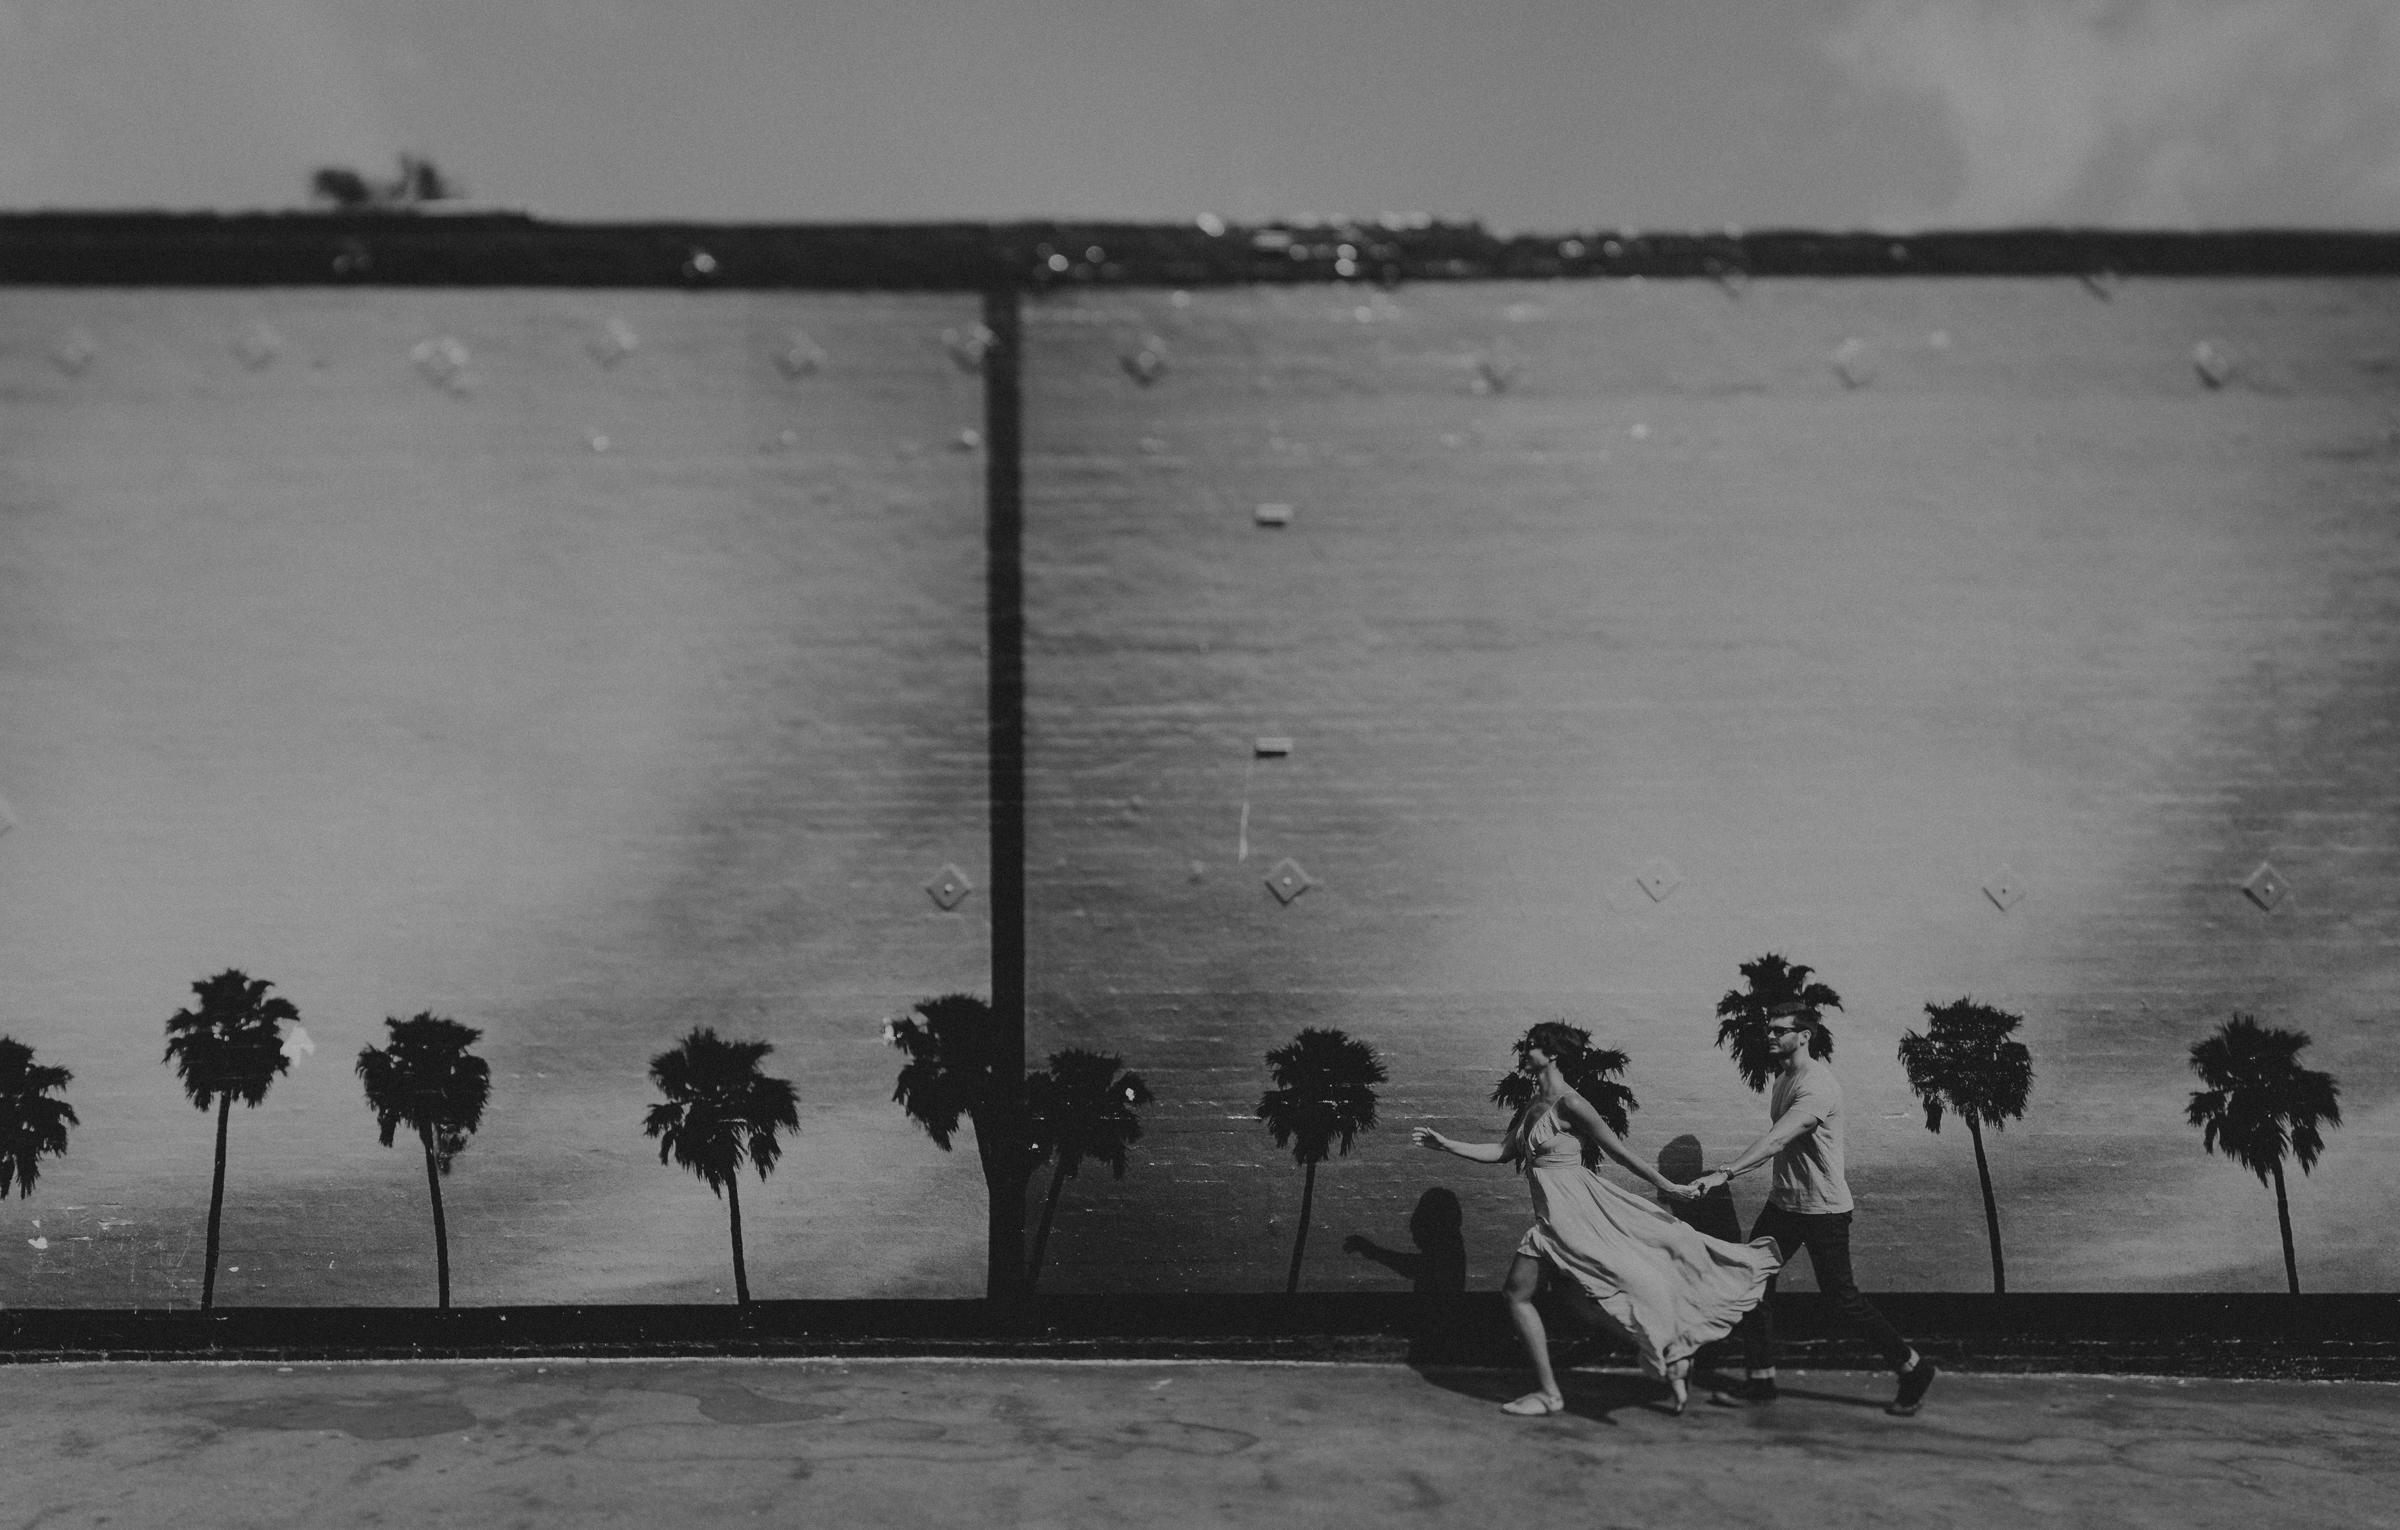 Isaiah + Taylor Photography - Venice Beach & Santa Monica Engagement Session, Los Angeles Wedding Photographer-031.jpg